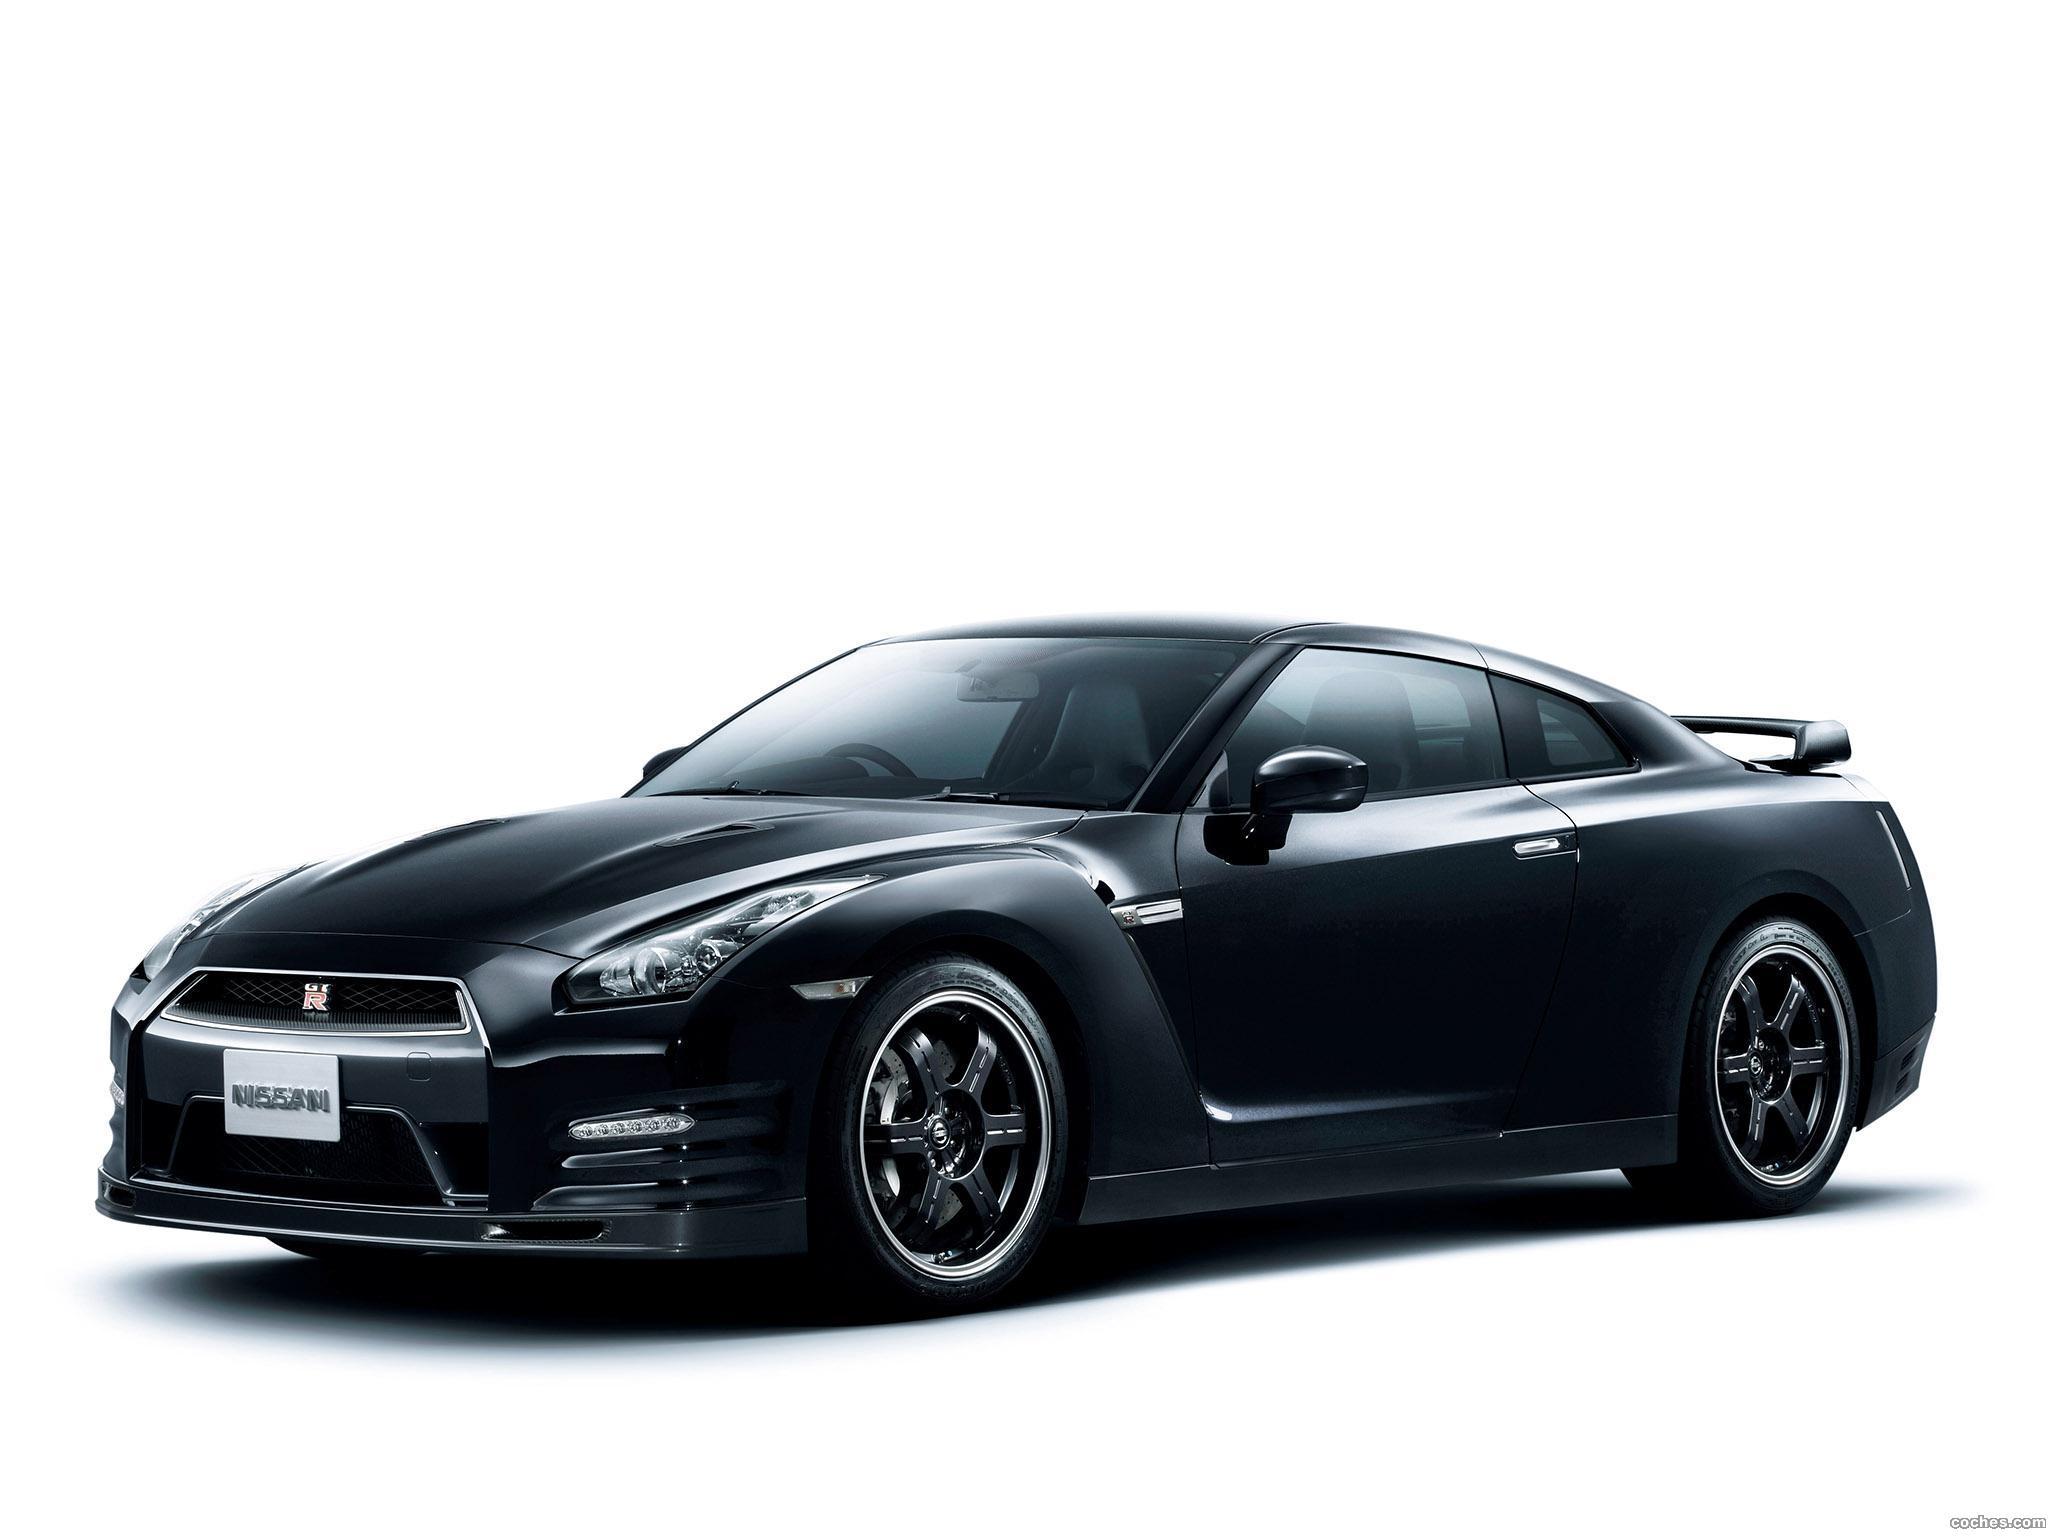 Nissan Gtr Precio >> Fotos de Nissan GT-R Spec-V 2010